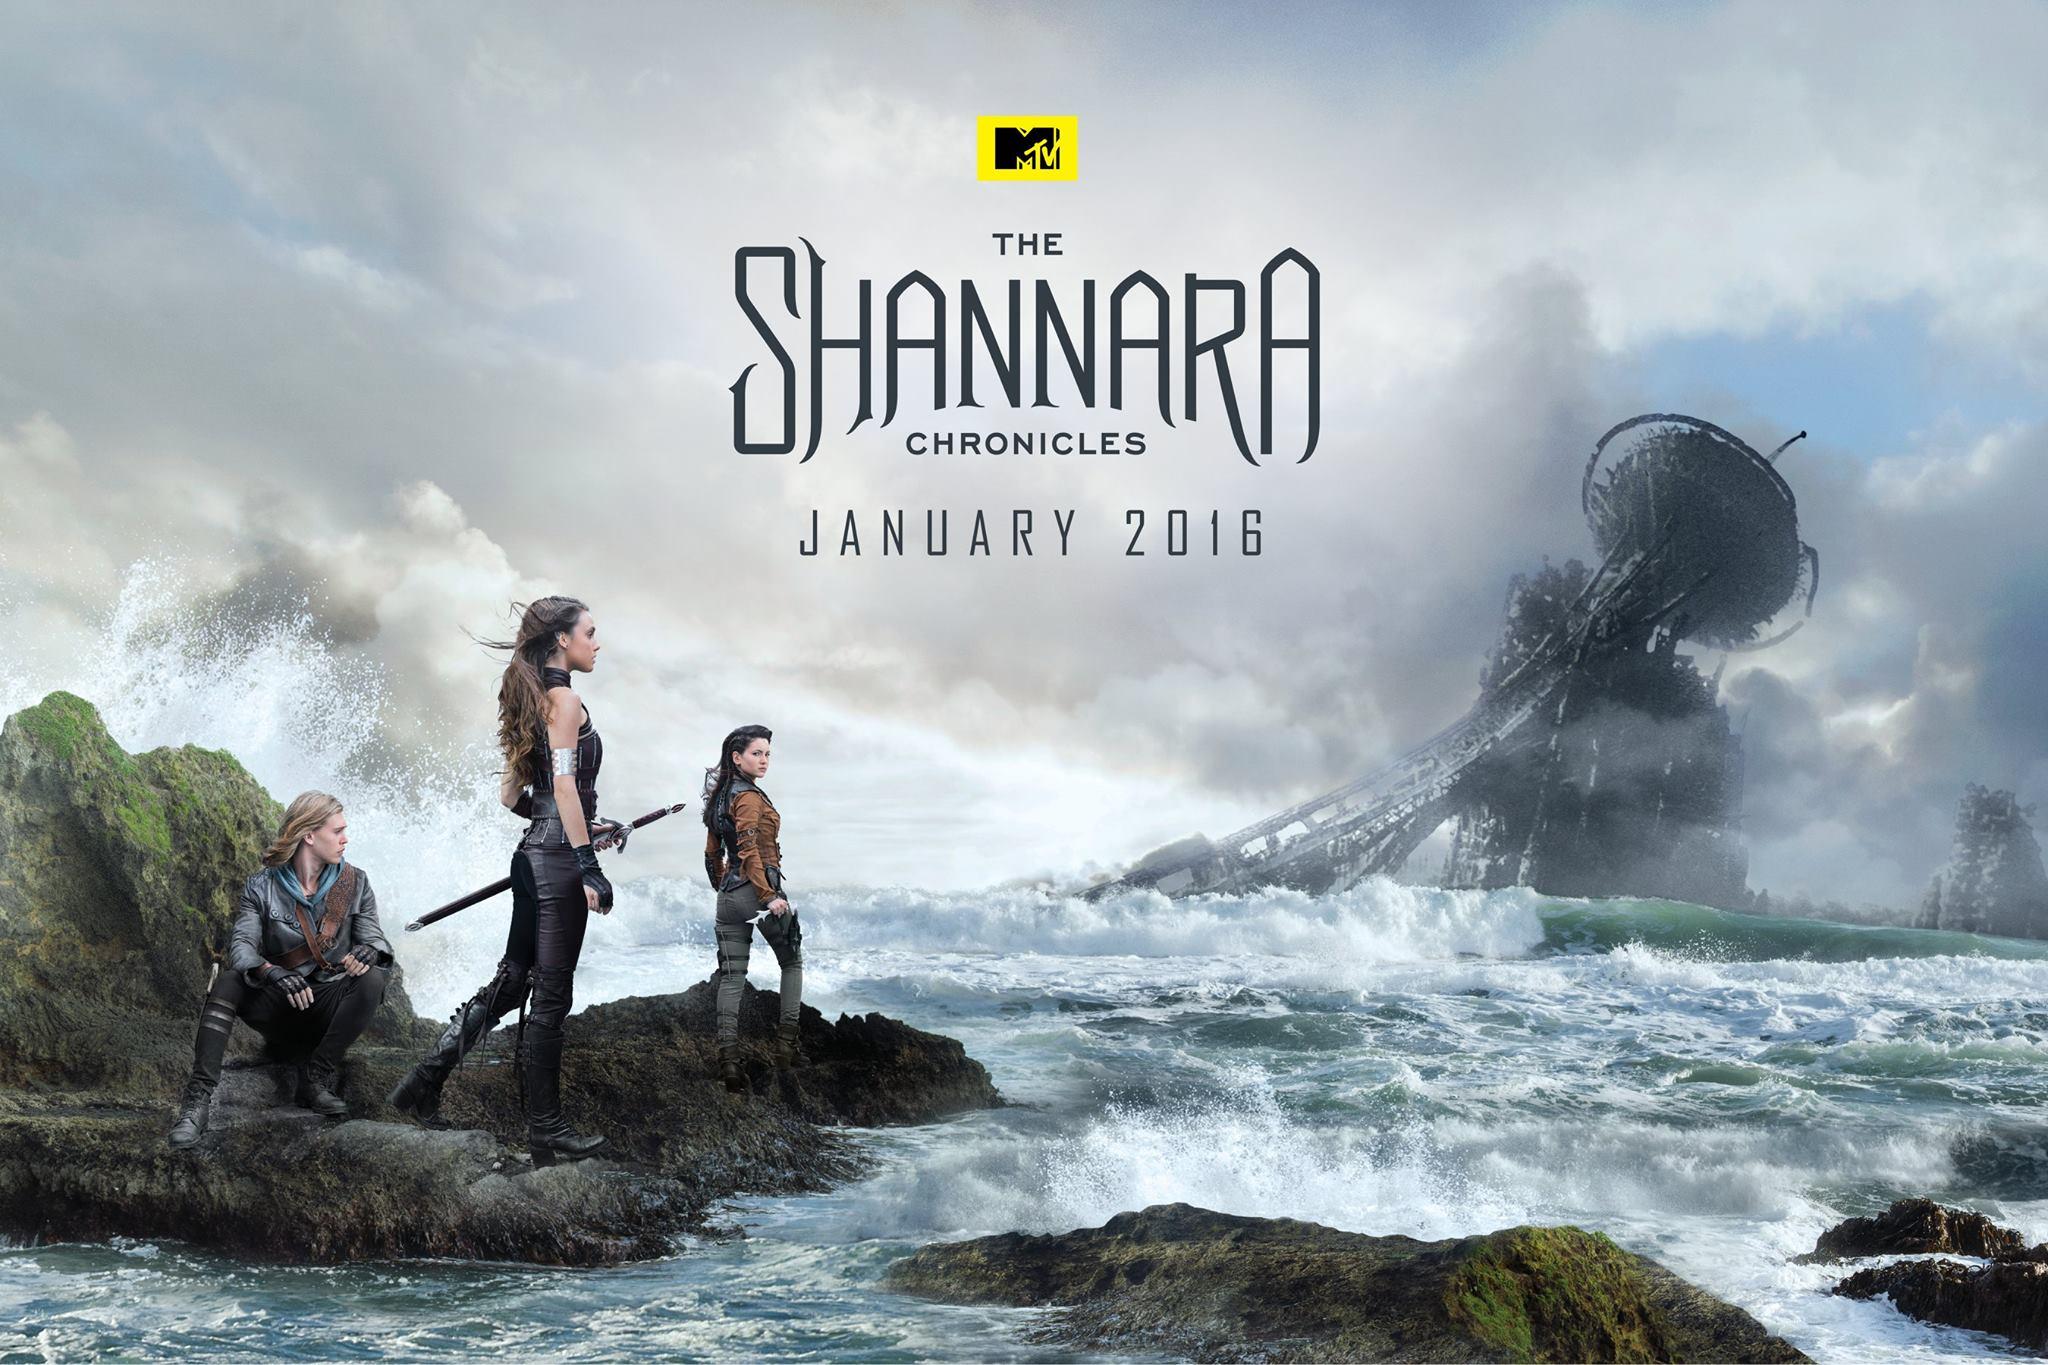 the shannara chronicles imagen